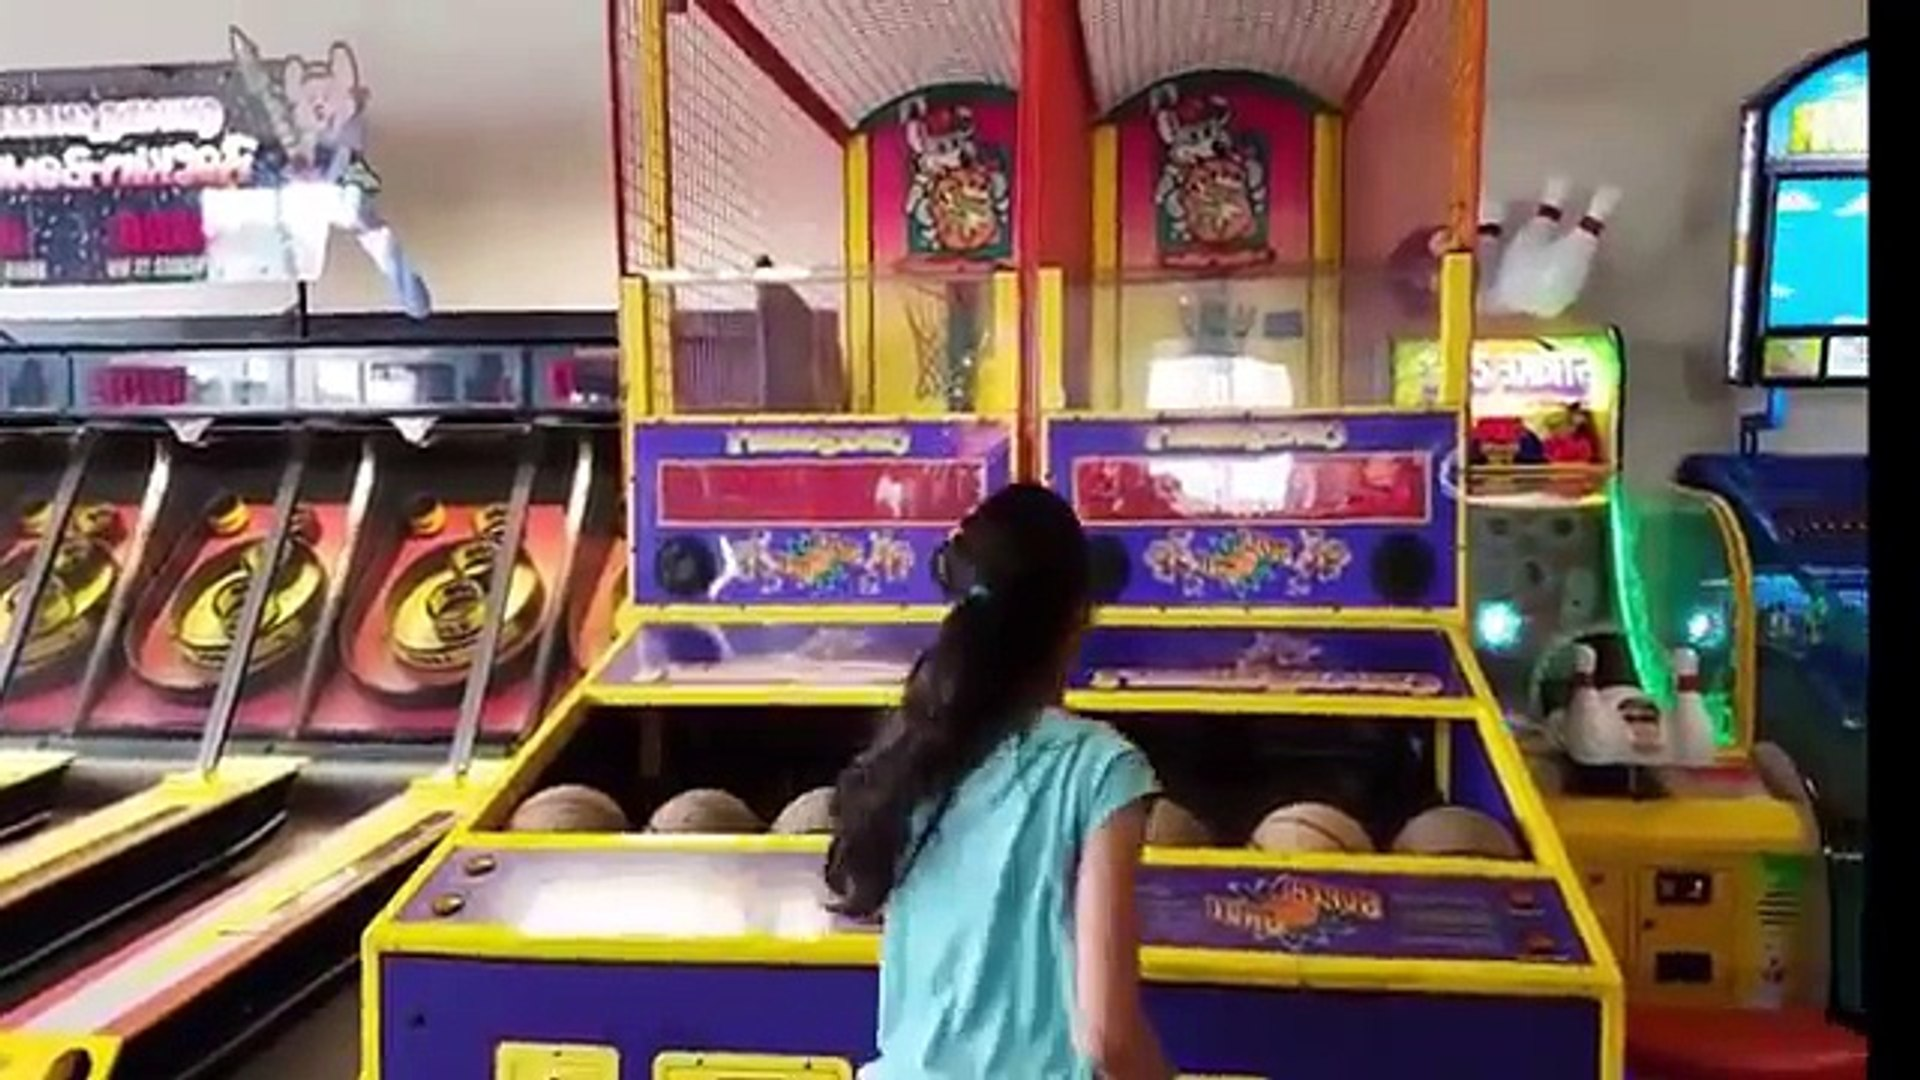 indoor^gaeme^for^kids^main^event^Entertainment